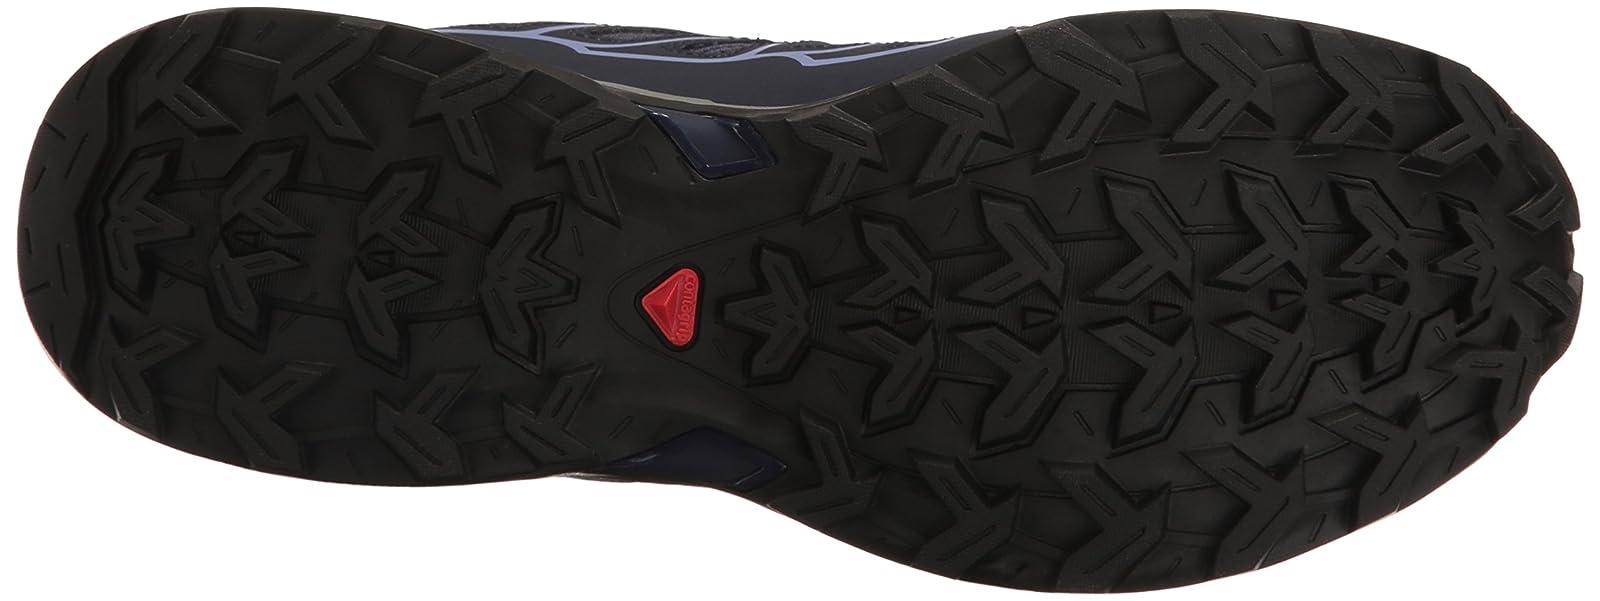 Salomon Women's X Ultra 2 GTX W Hiking Shoe 7 M US - 3